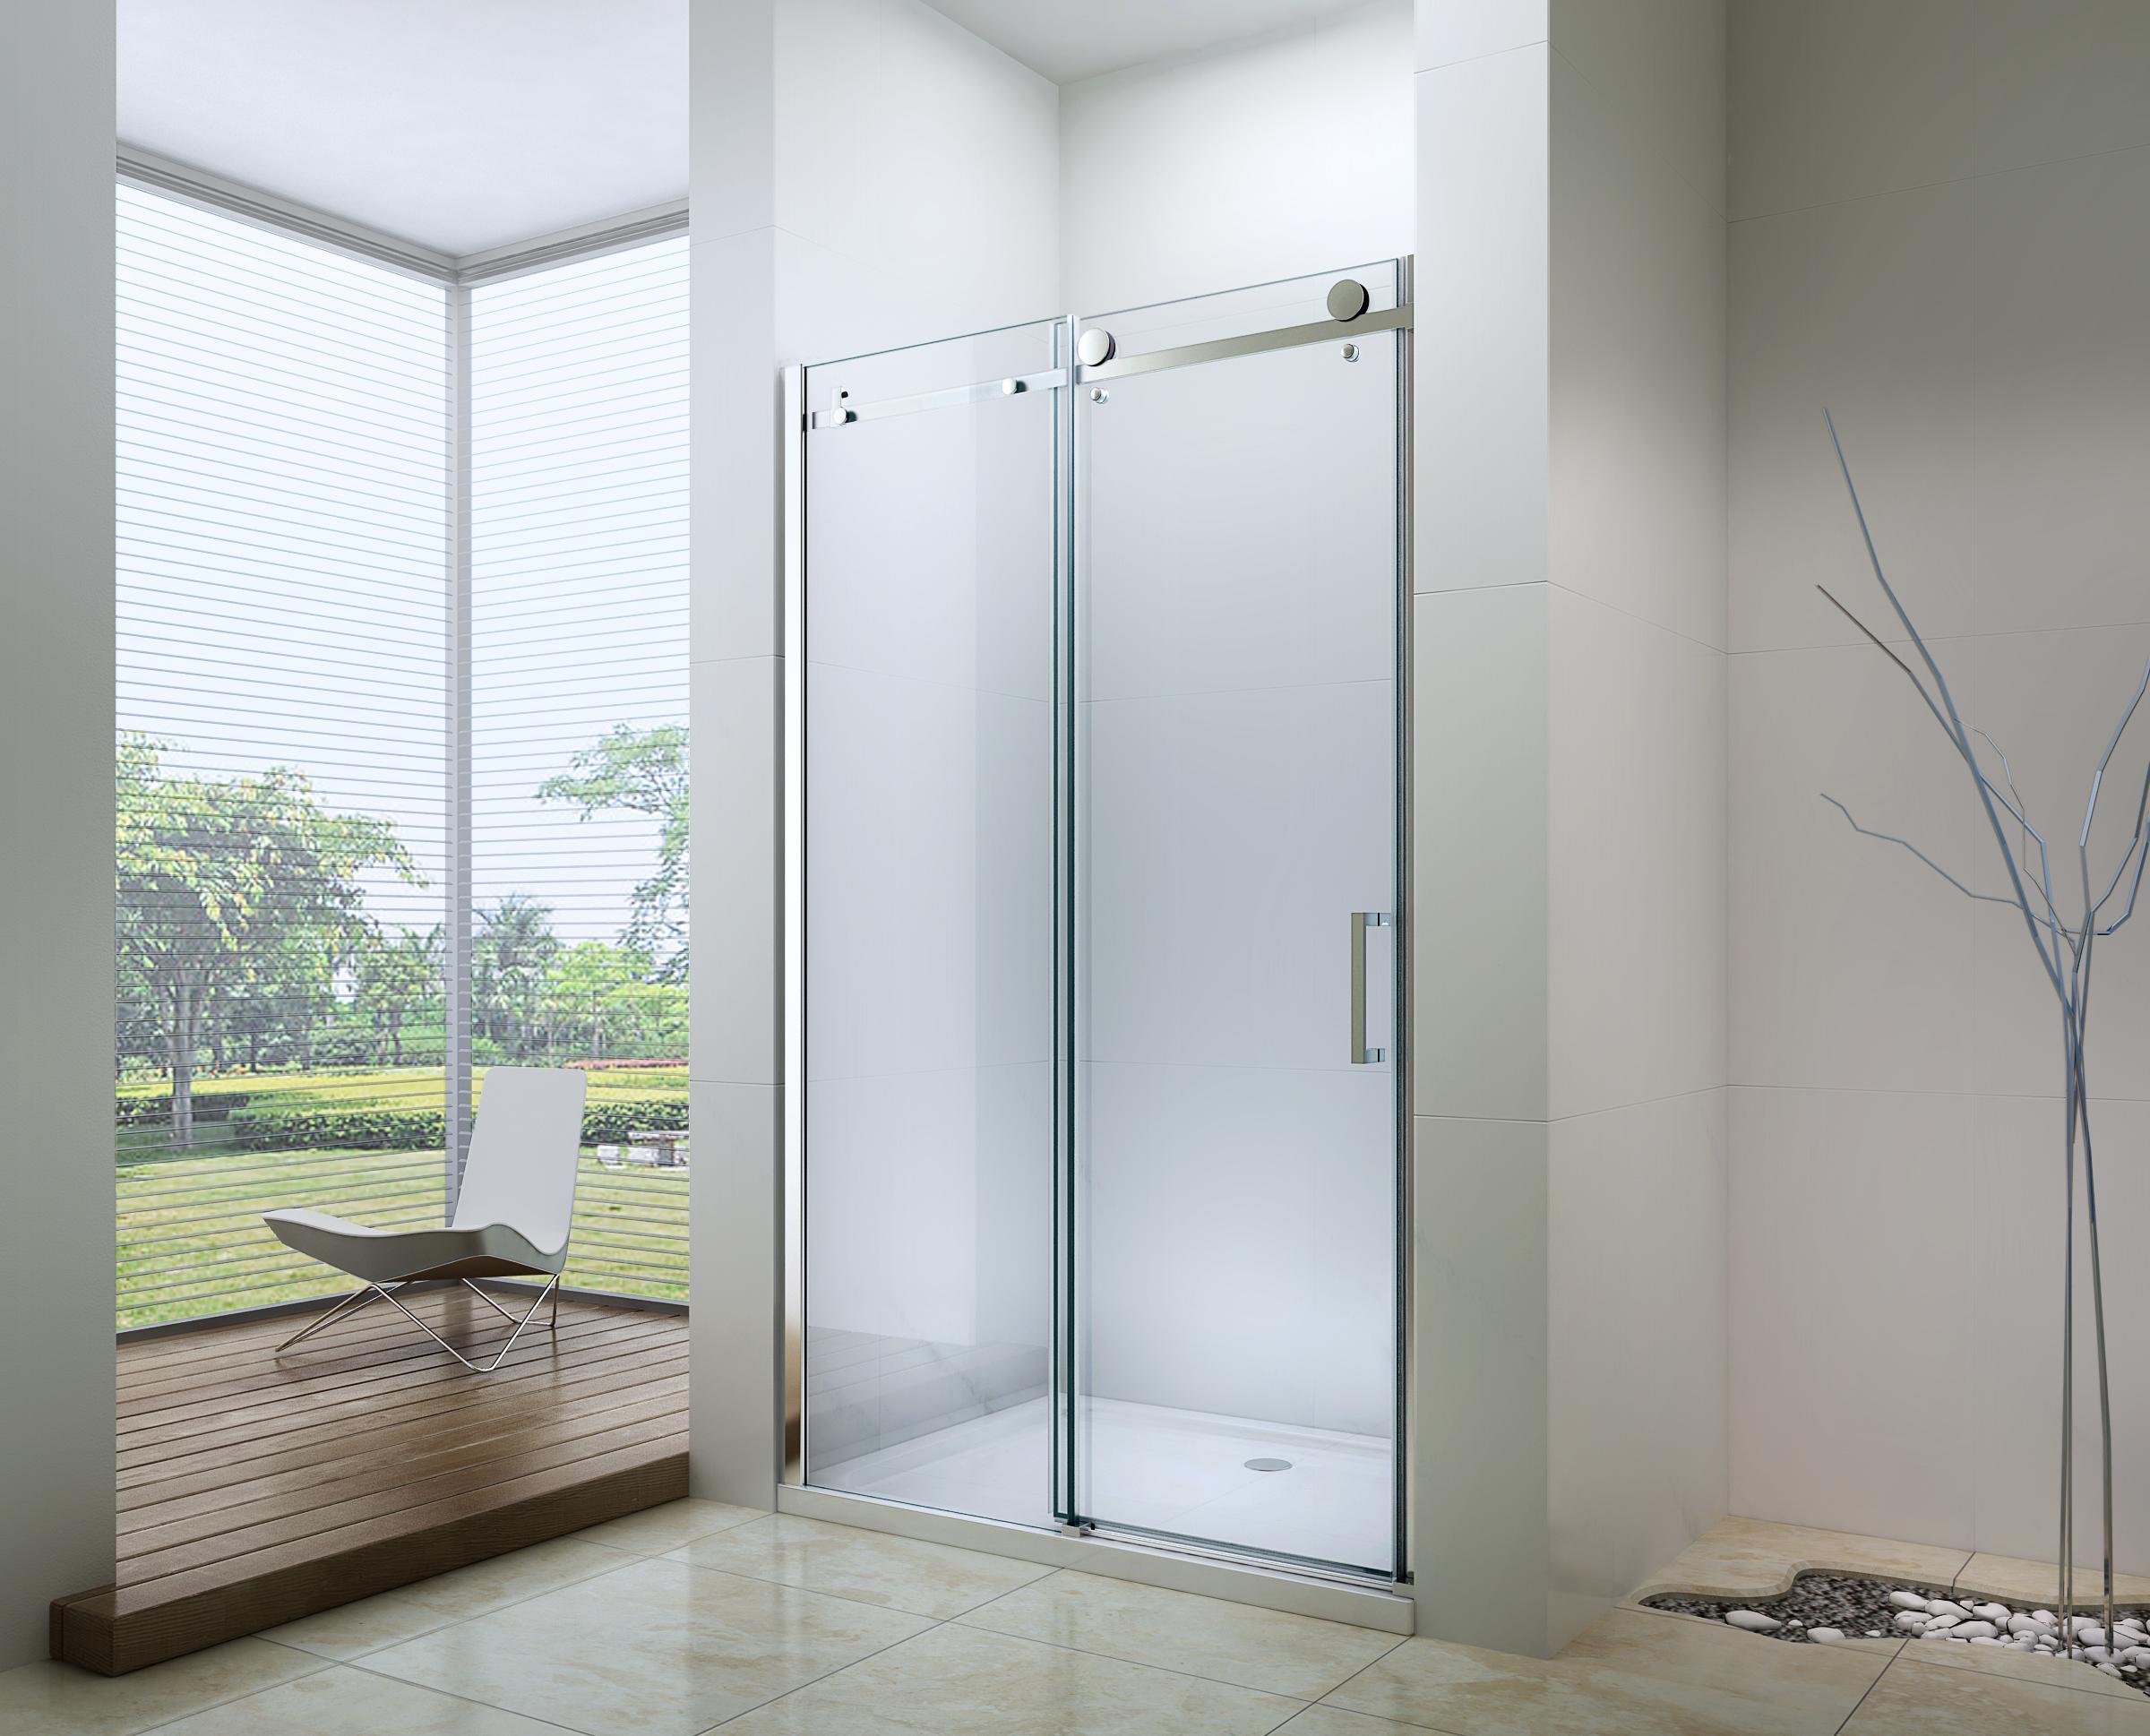 Locker Room Shower Corner Glass Shower Stall Replacement Cost Sliding Glass Shower Stall Buy Sliding Glass Shower Door Locker Room Shower Corner